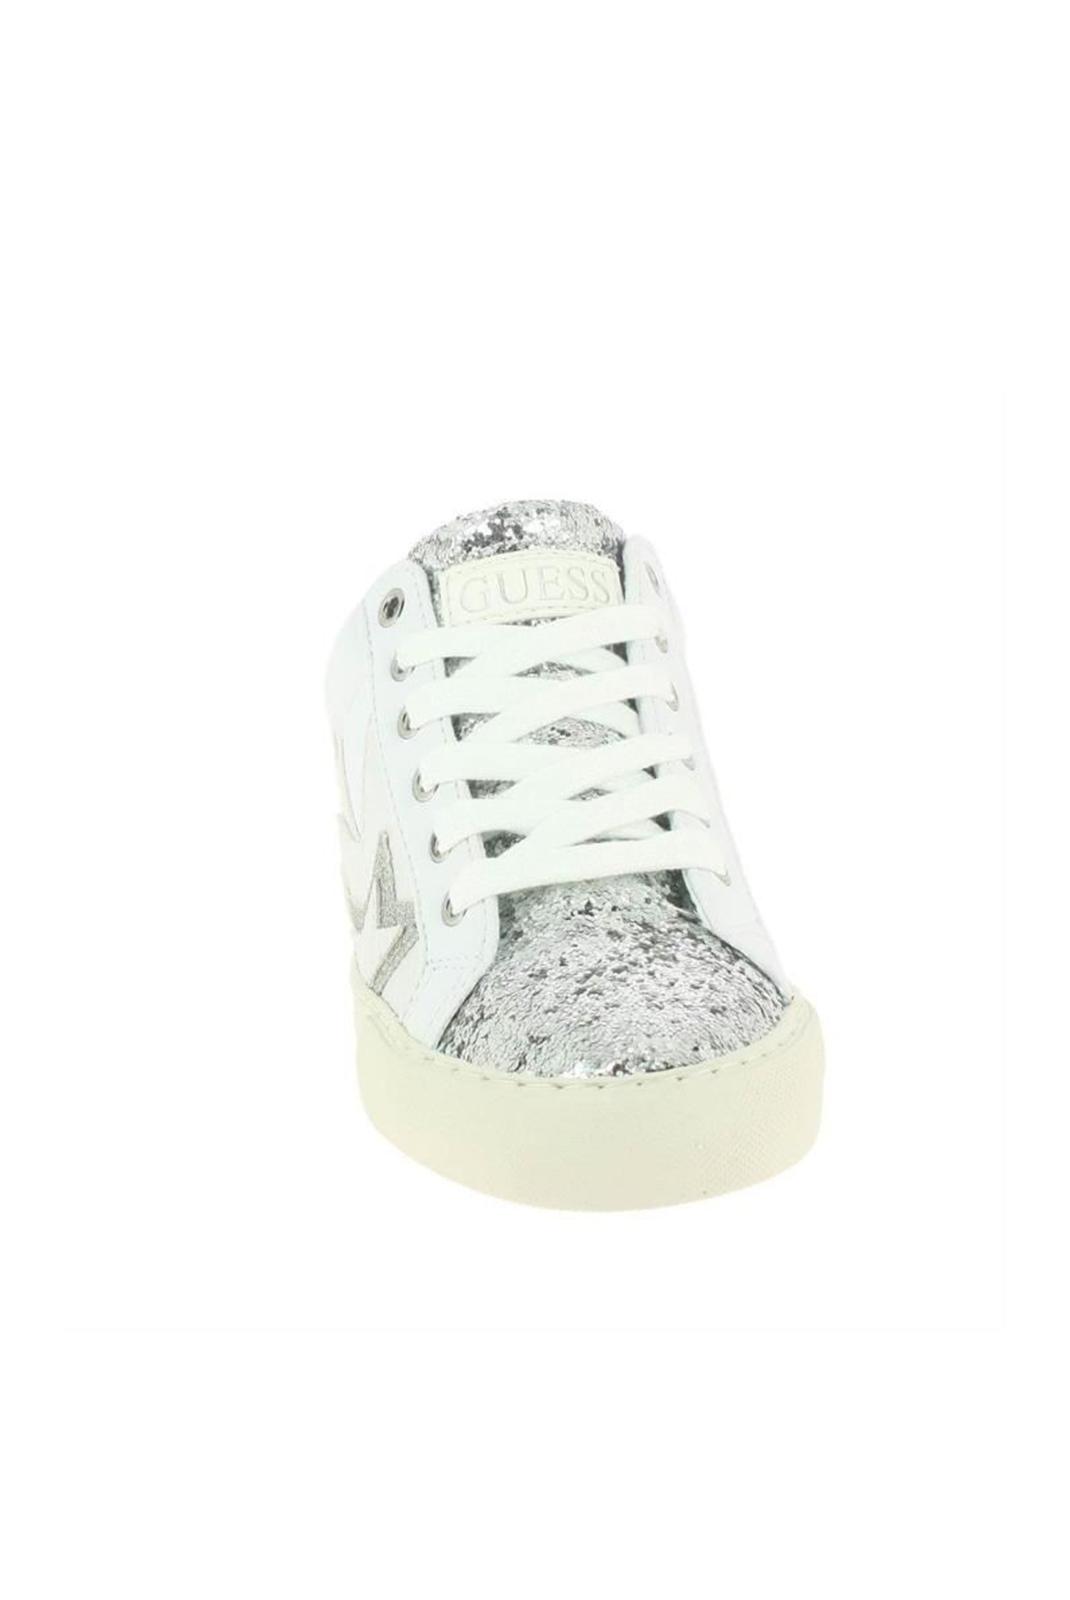 Baskets / Sneakers  Guess jeans FLPOT4 PEL12 WHITE